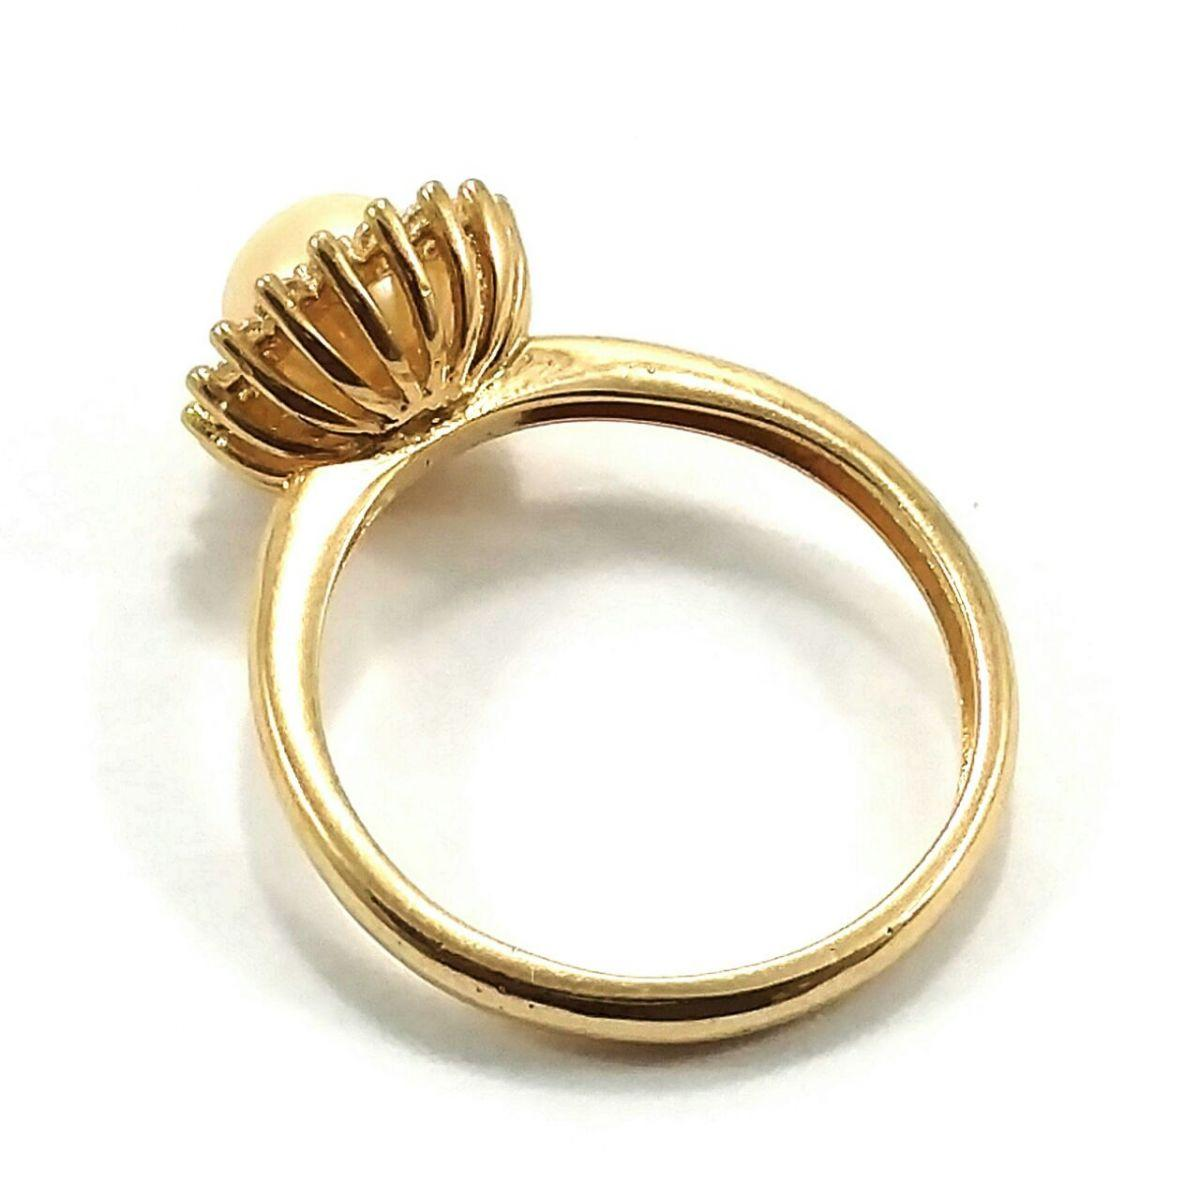 234aa323c981f Anel de ouro 18k princesa pérola - Midasstore - Anel - Magazine Luiza